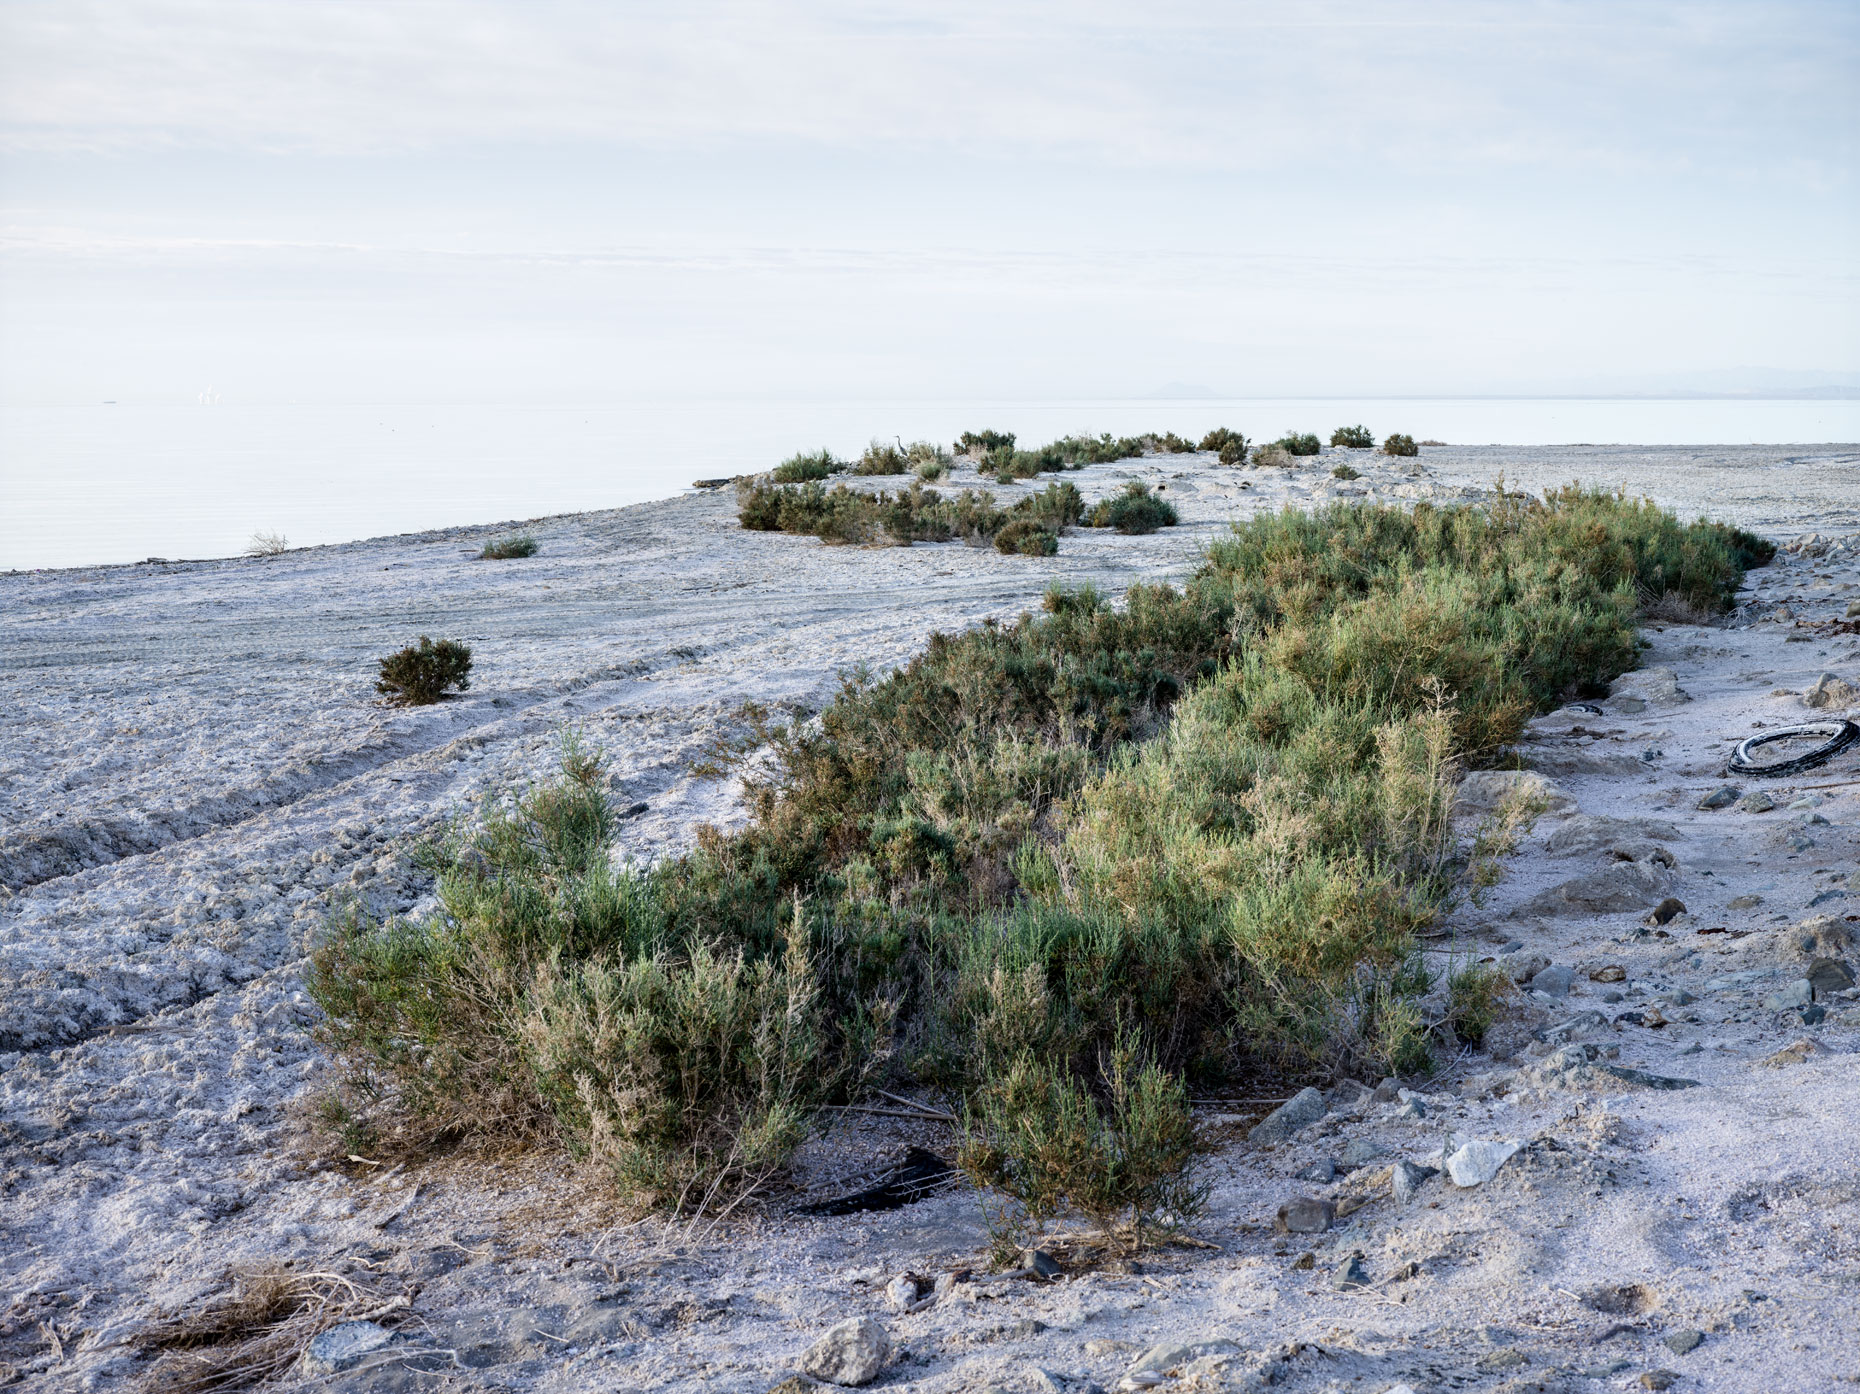 Salton Sea brush along the shore of Bombay Beach